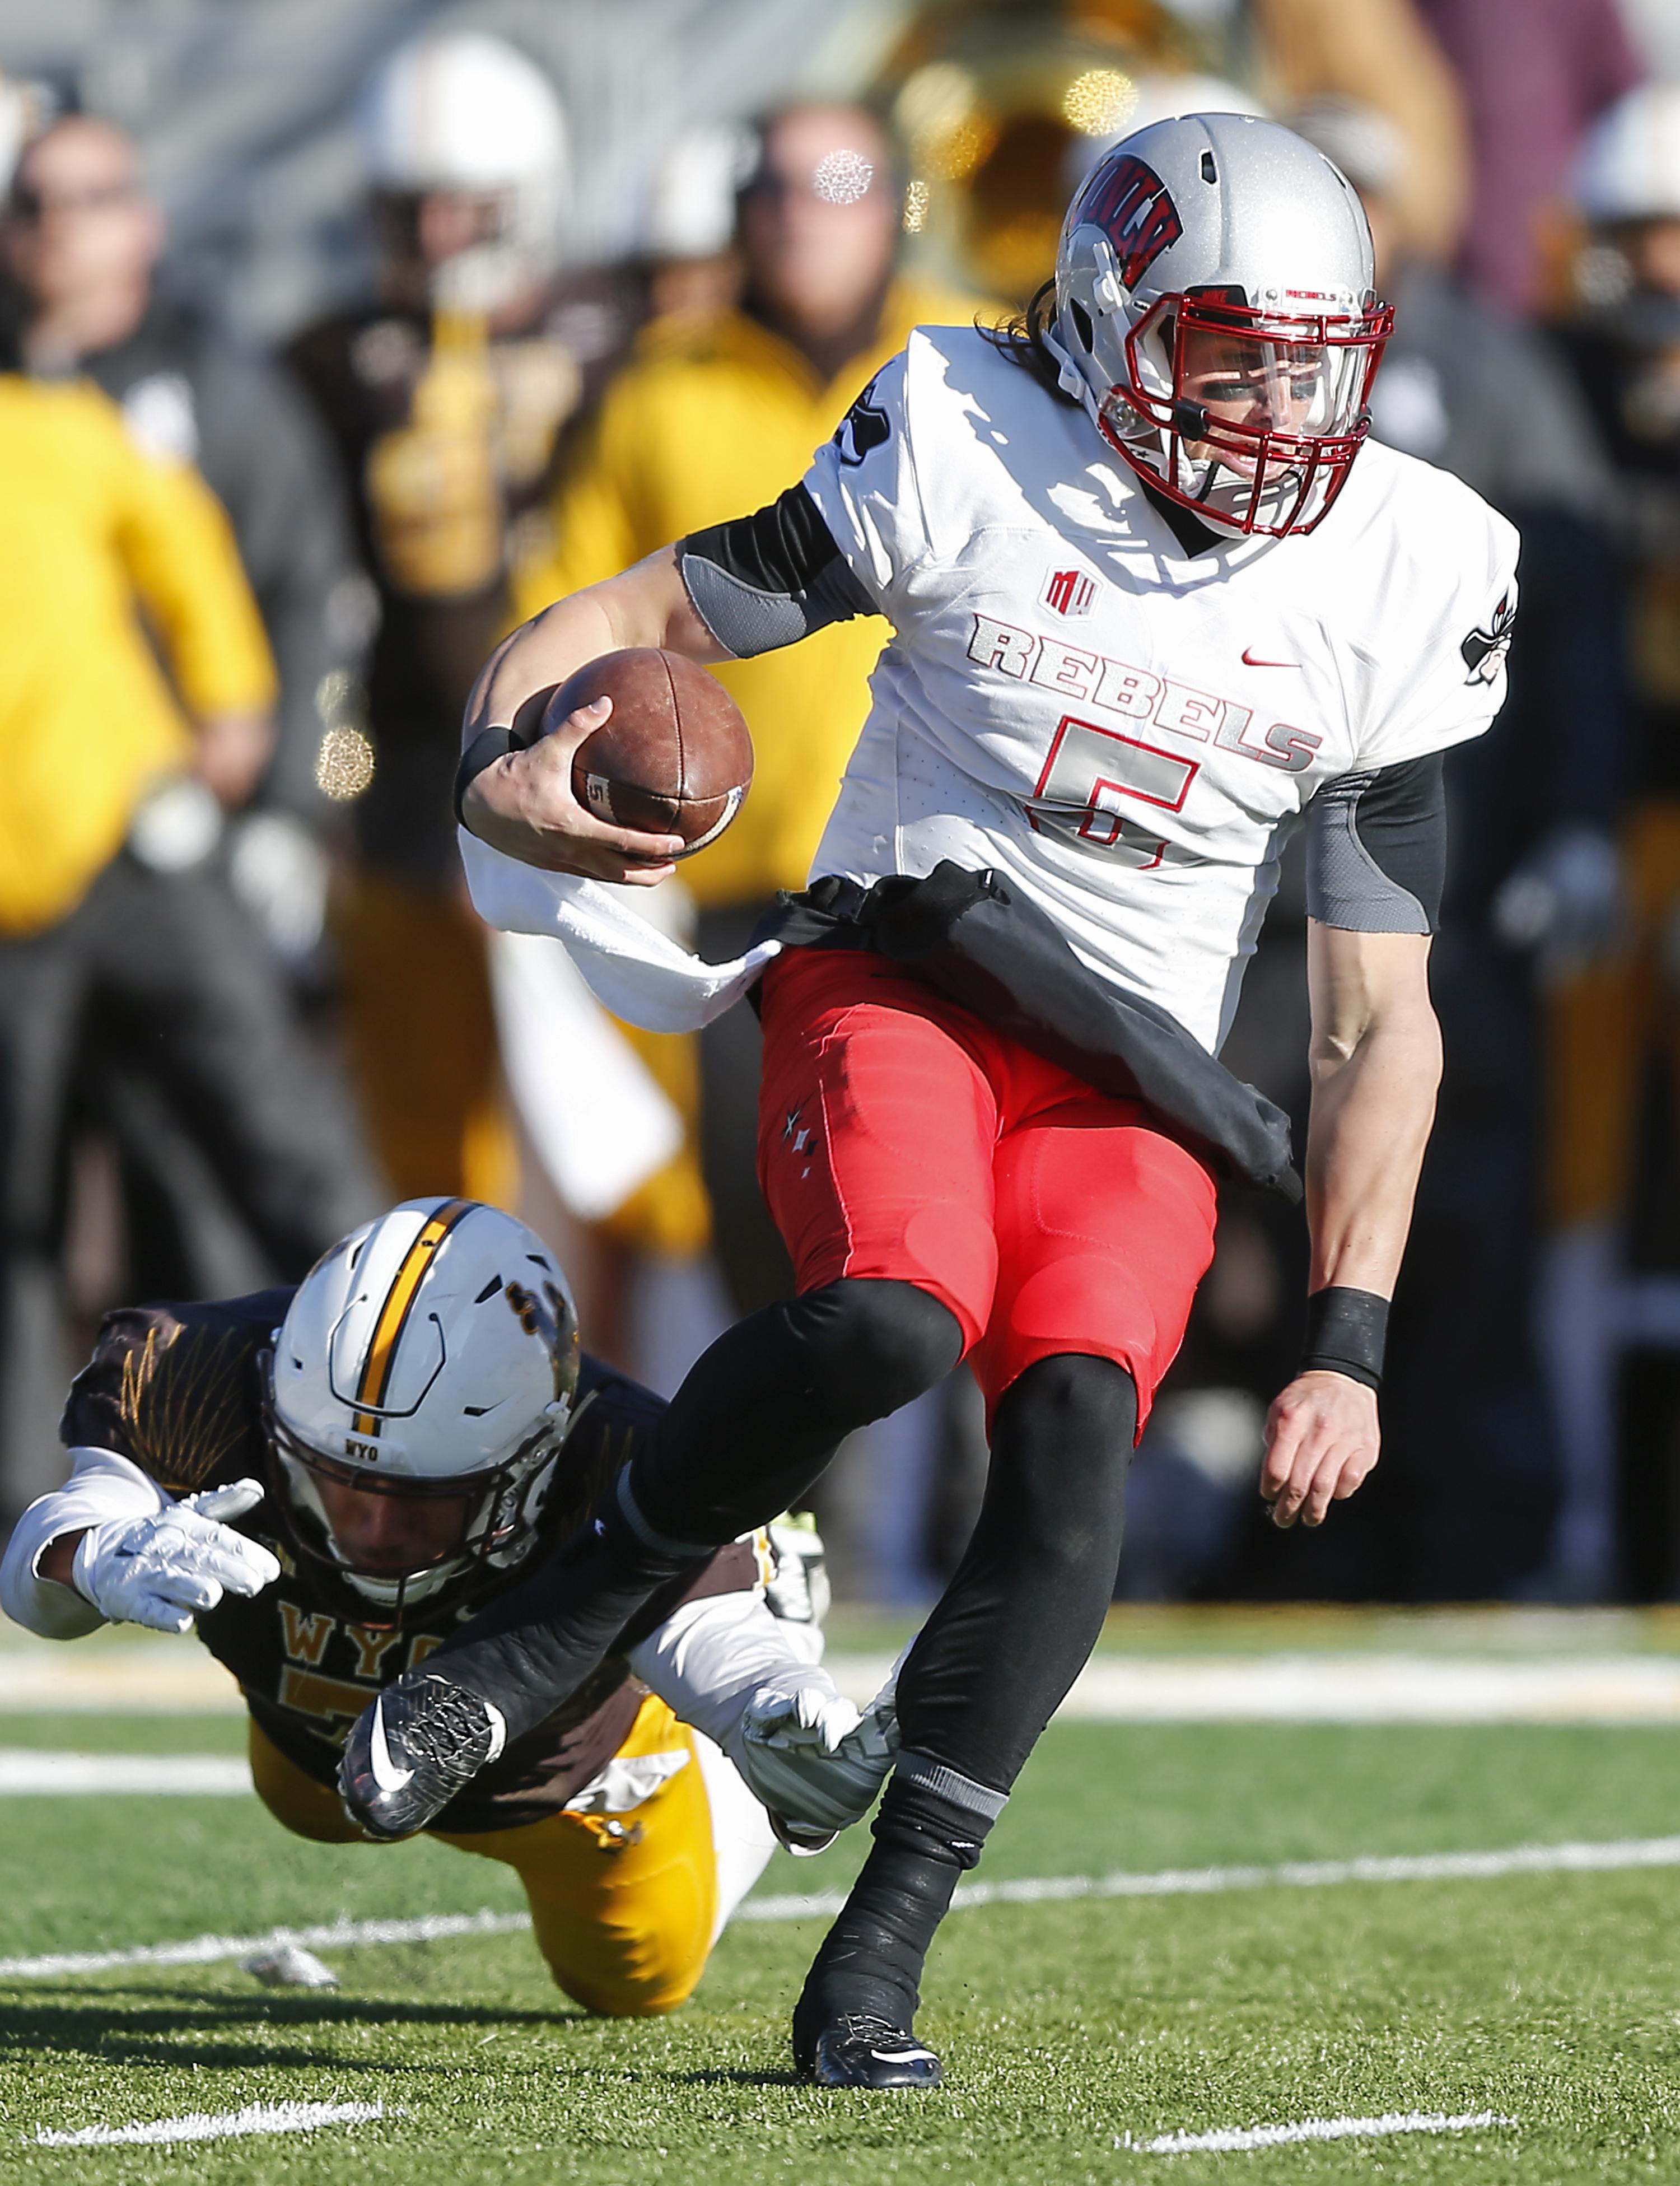 UNLV quarterback Blake Decker  runs past a Wyoming defender during the second quarter of an NCAA college football game, Saturday, Nov. 28, 2015, in Laramie, Wyo. (AP Photo/Michael Smith)